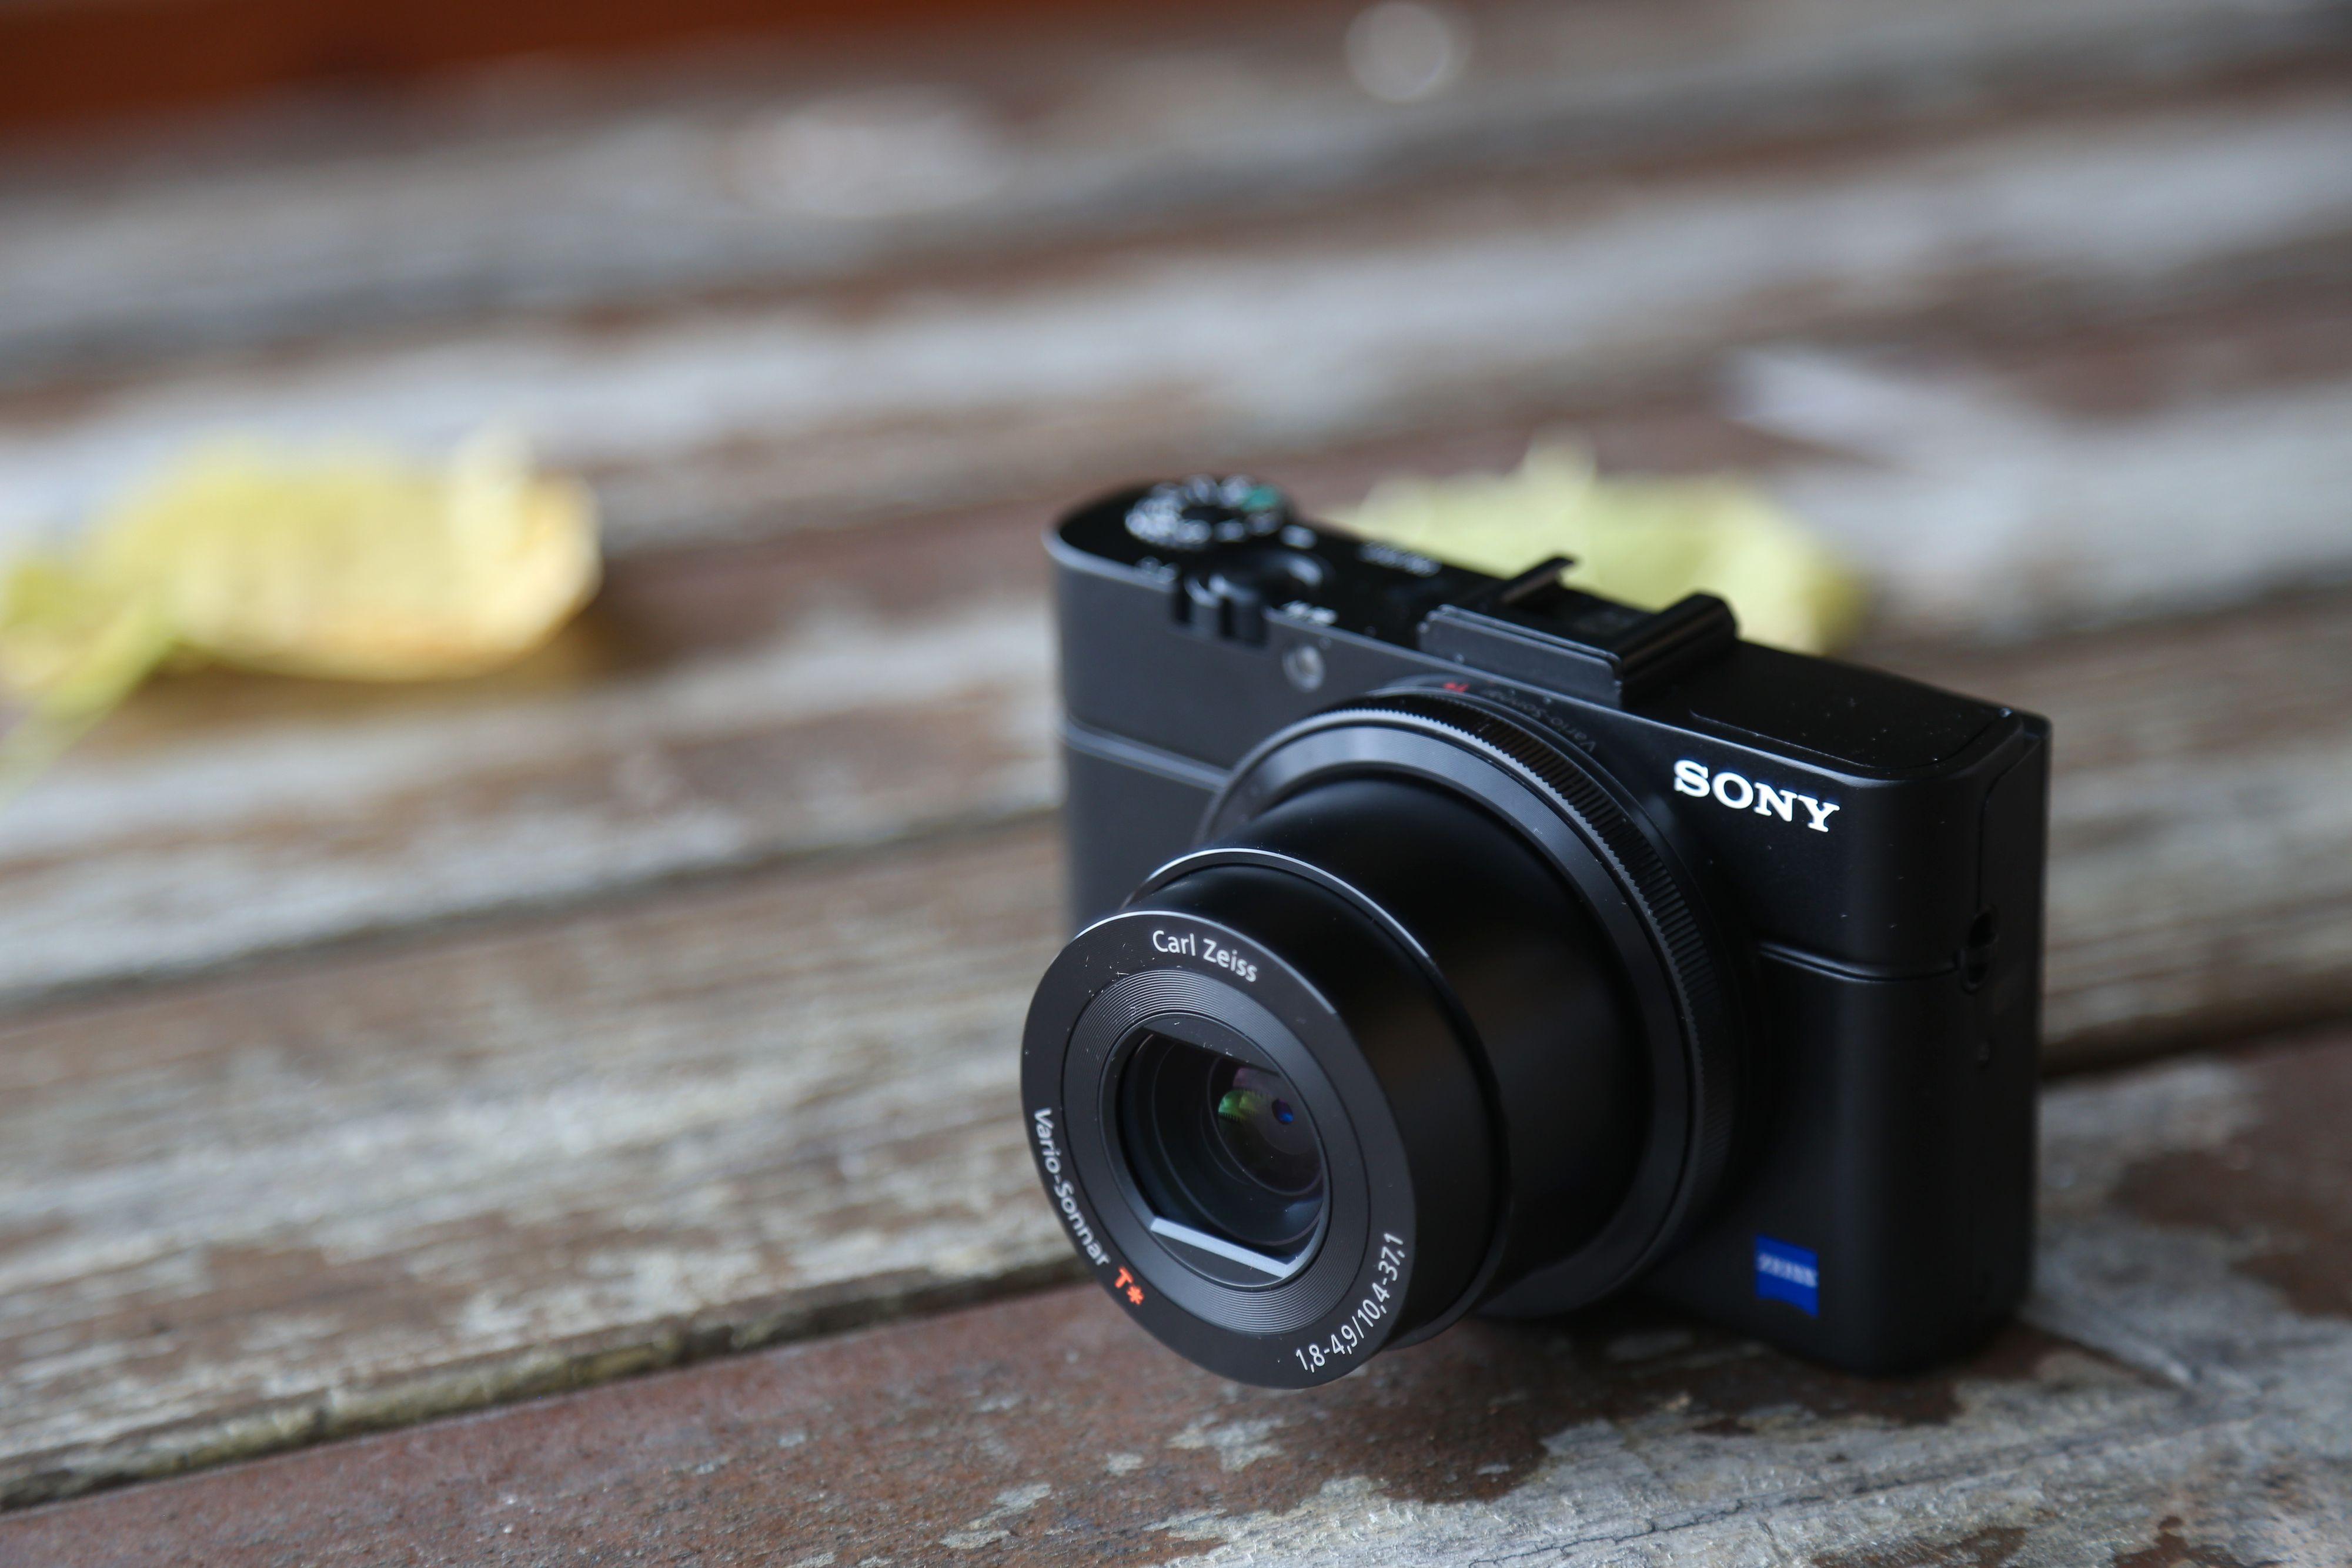 Sony RX100 Mark II er en godsak. Kommer Sony med en ny en i 2014?Foto: Eivind Hauger / Akam.no